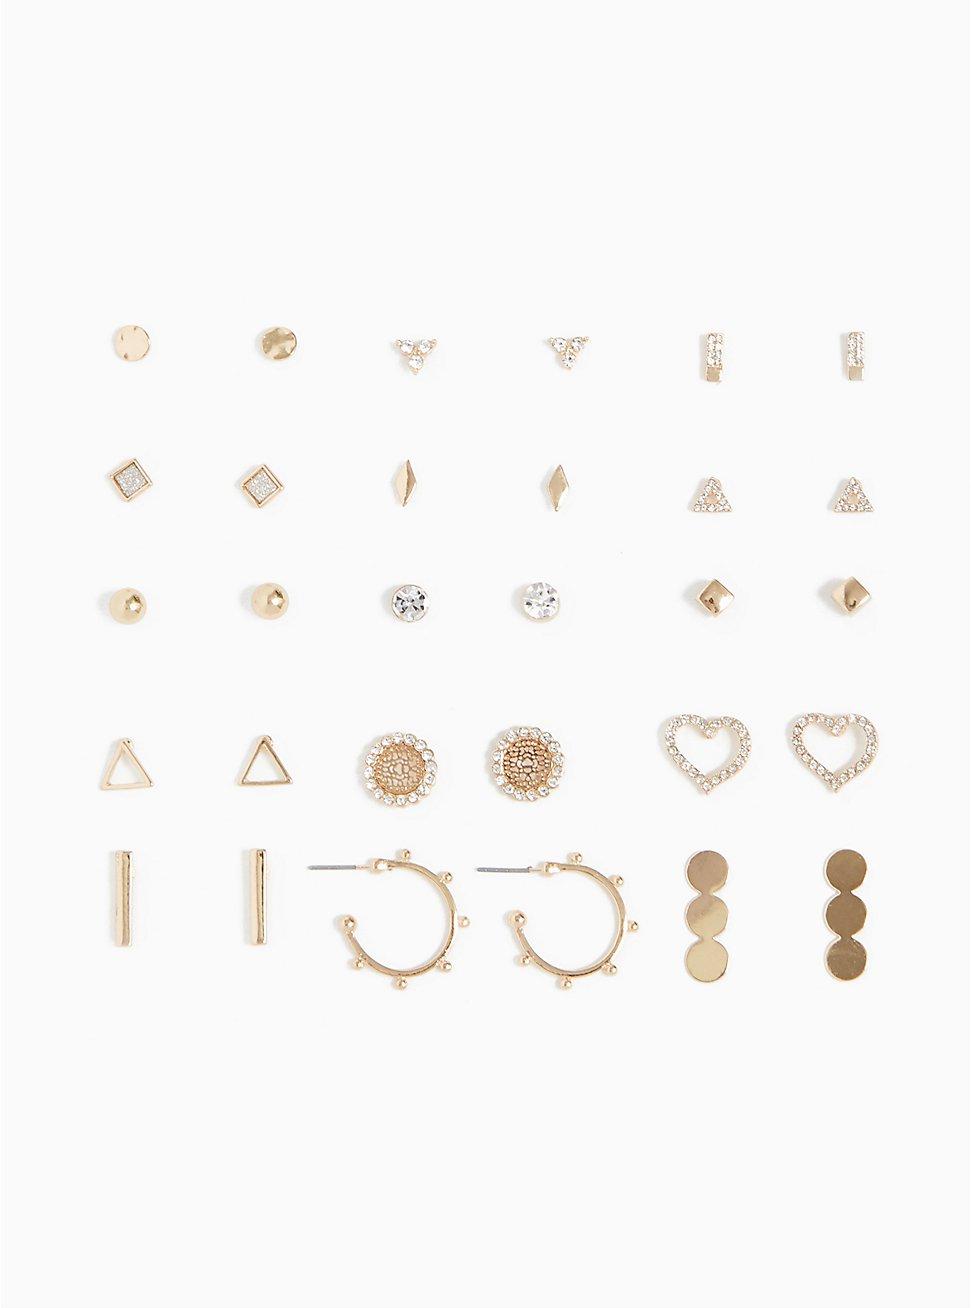 Gold-Tone Triangle Stud & Huggie Earrings Set - Set of 15, , hi-res